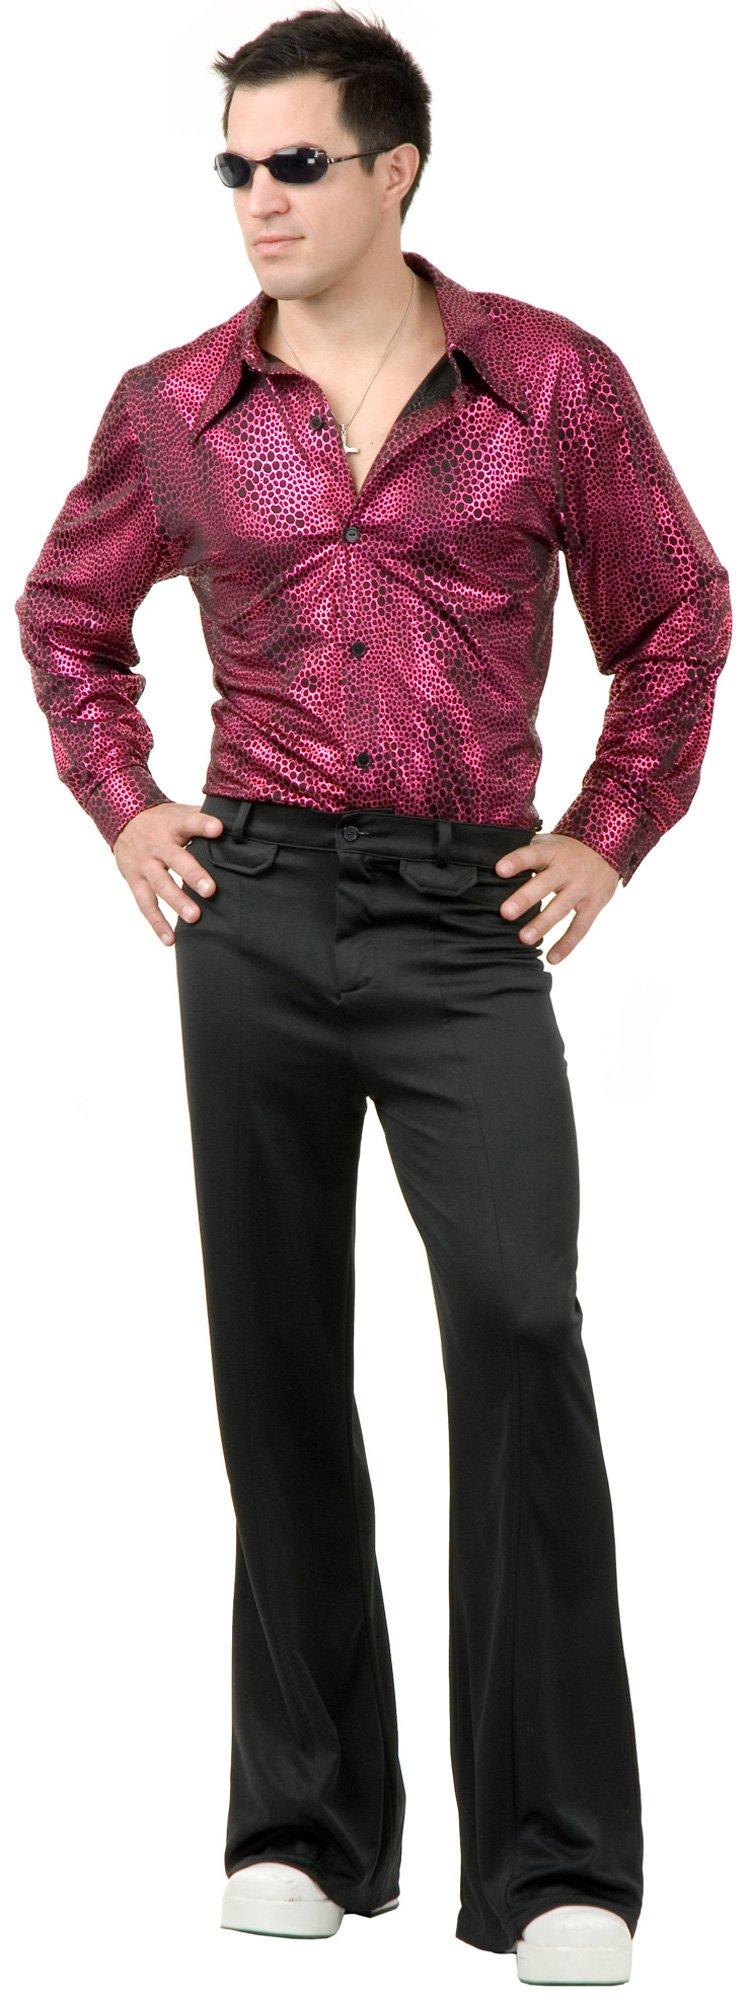 C418 60s 70s Mens Disco Shirt Hologram Adult Halloween Costume M L XL